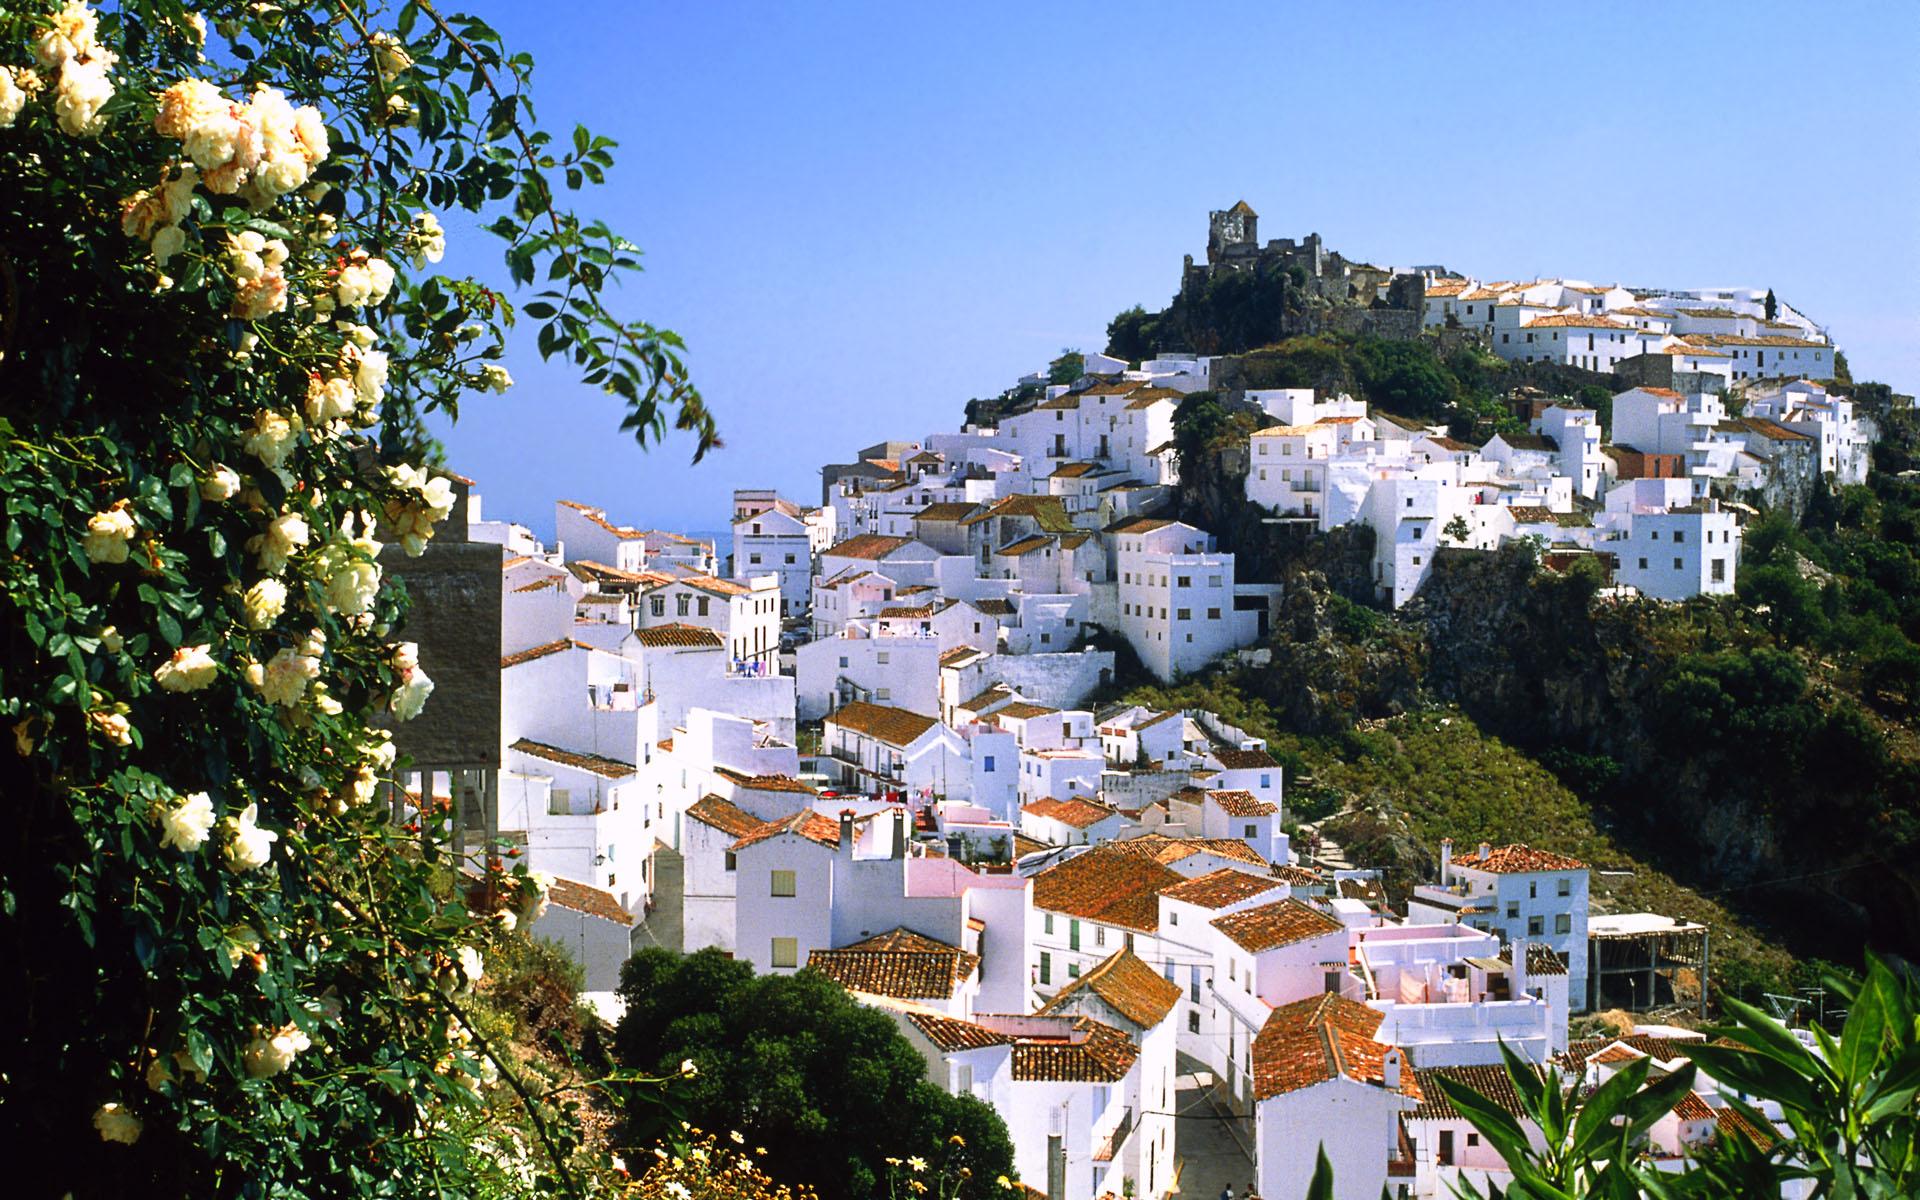 Look at the mountain village Casares, Malaga, Spain